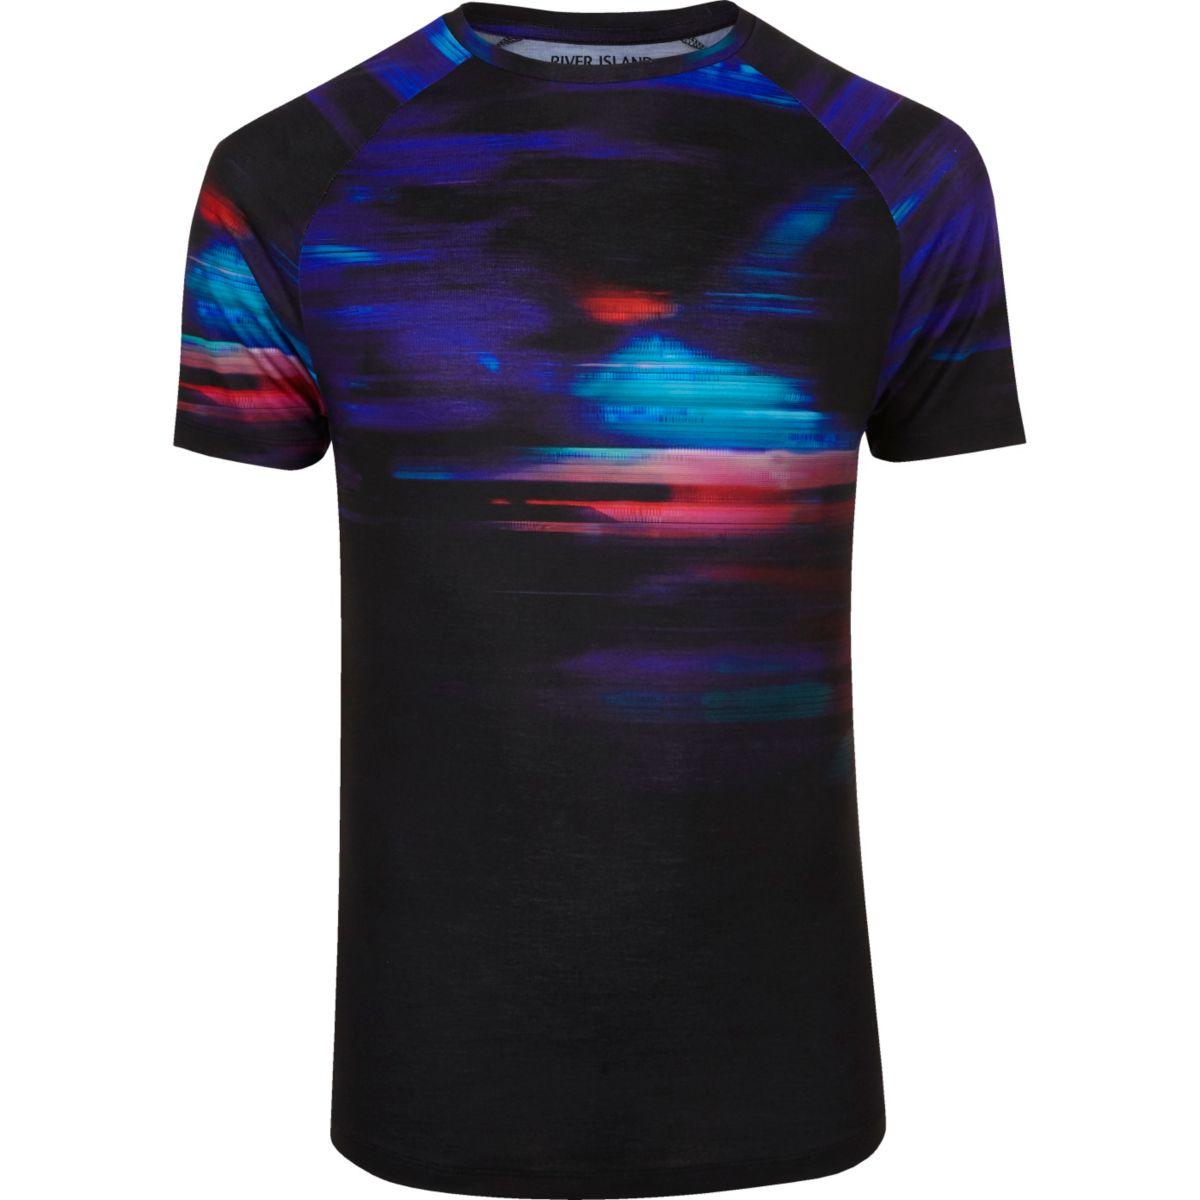 Black faded glitch print muscle fit T-shirt